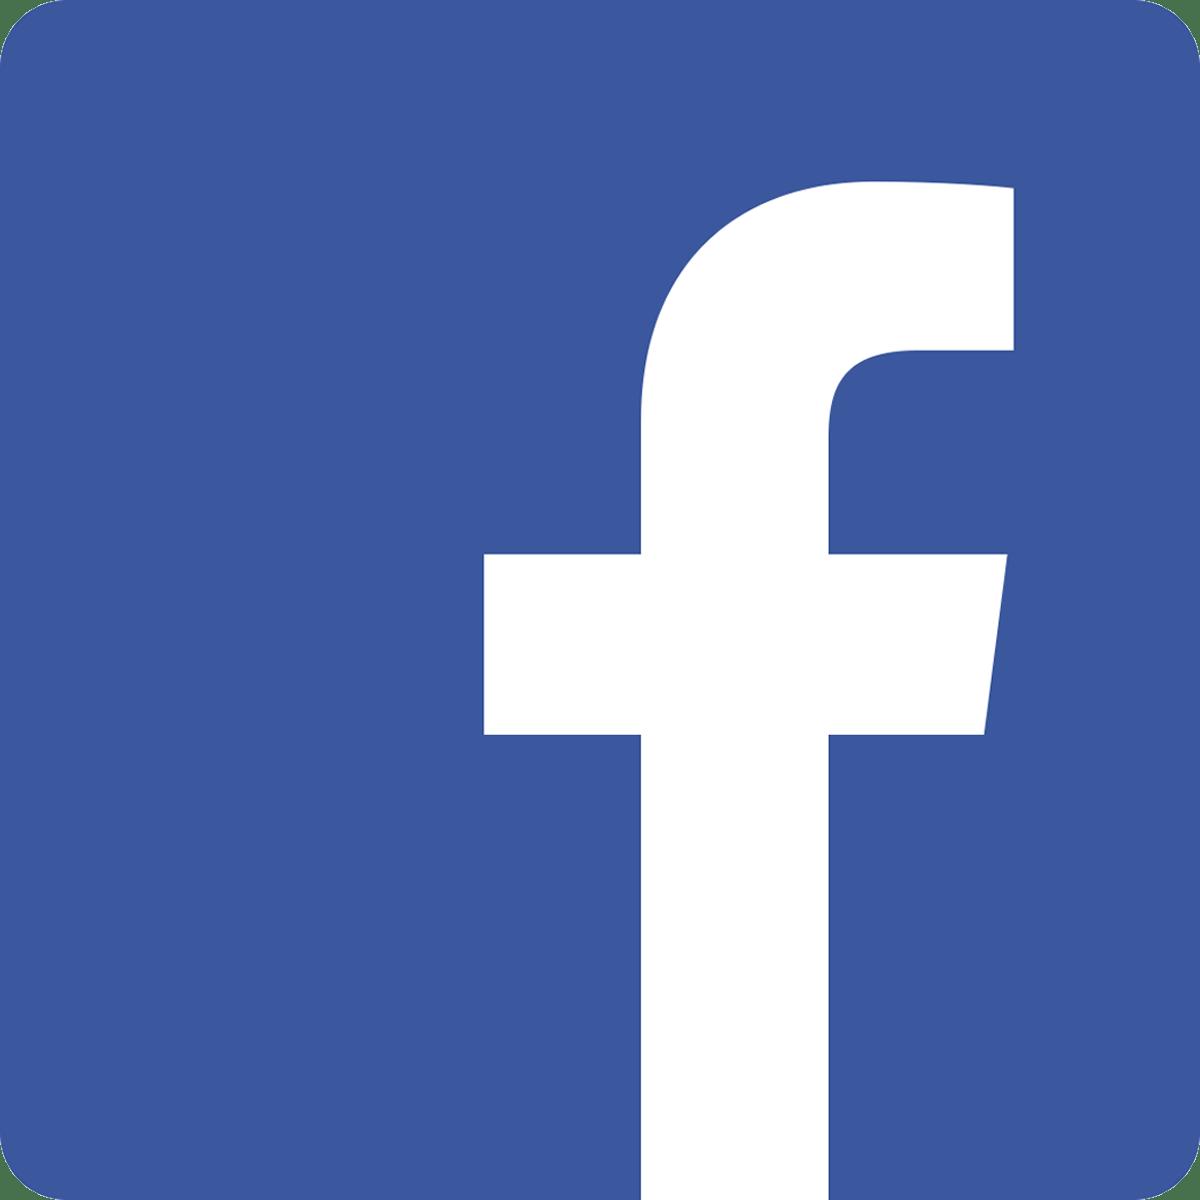 facebook logo vector marsfall rh marsfallpodcast com vector facebook logo black vector facebook logo download